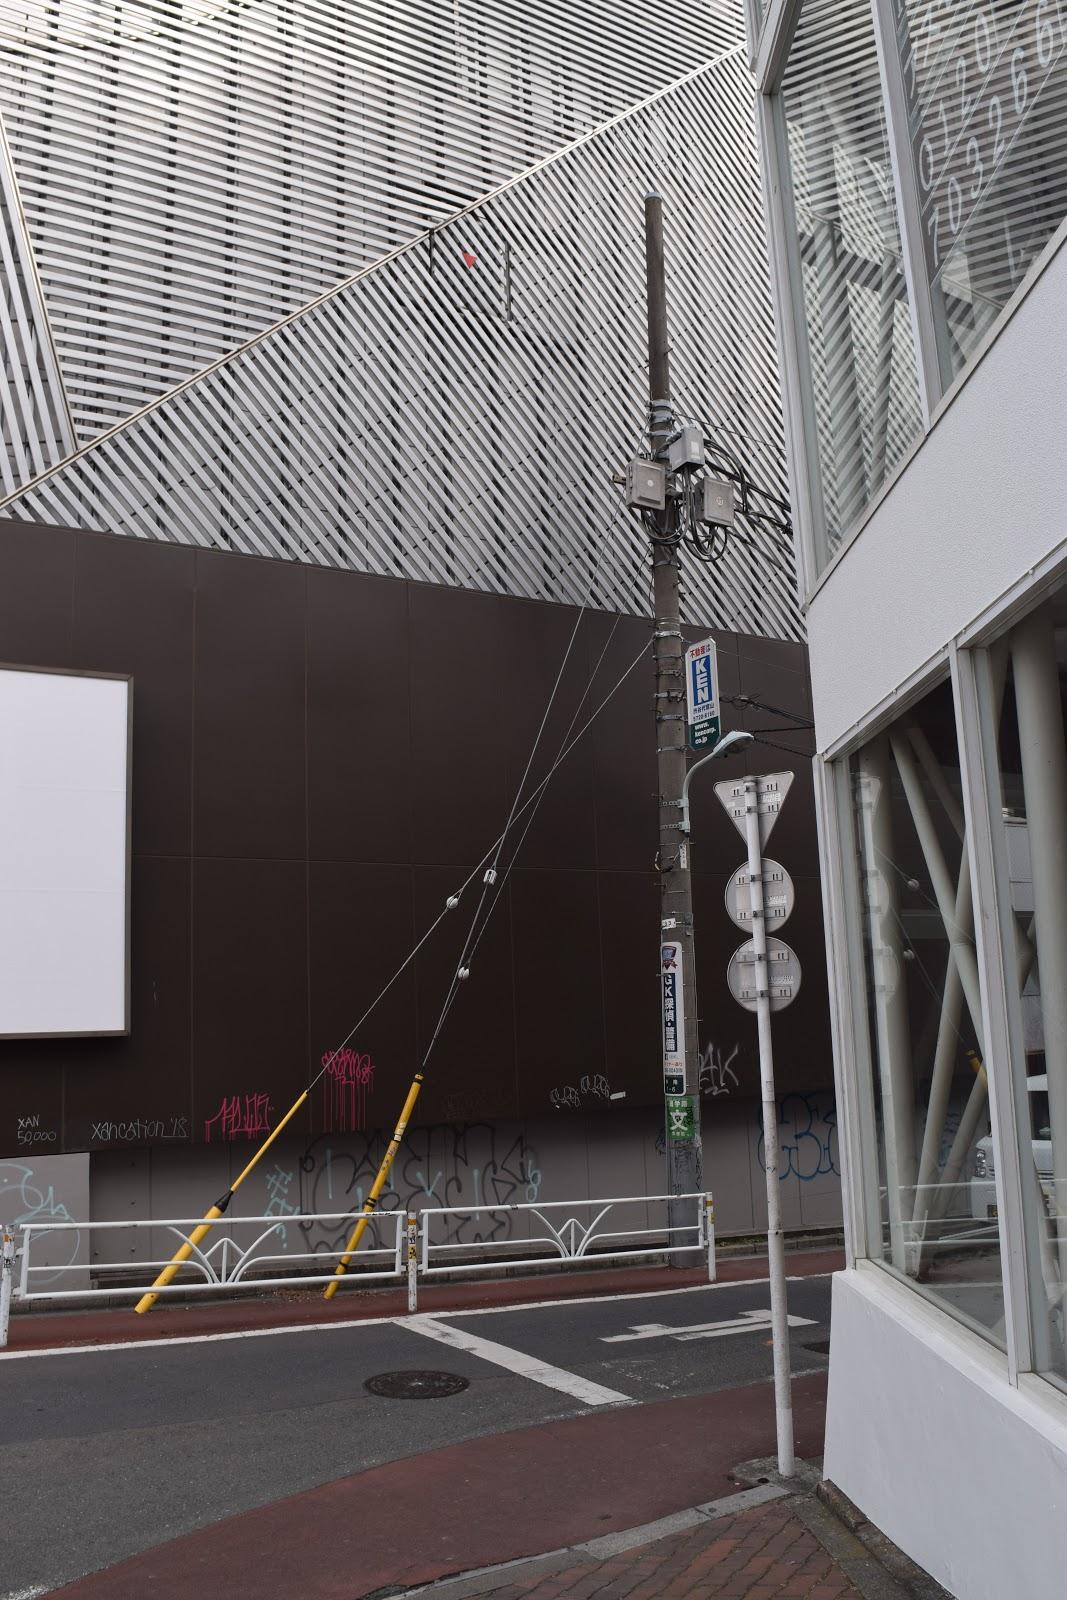 Backstreet in Shibuya, Tokyo